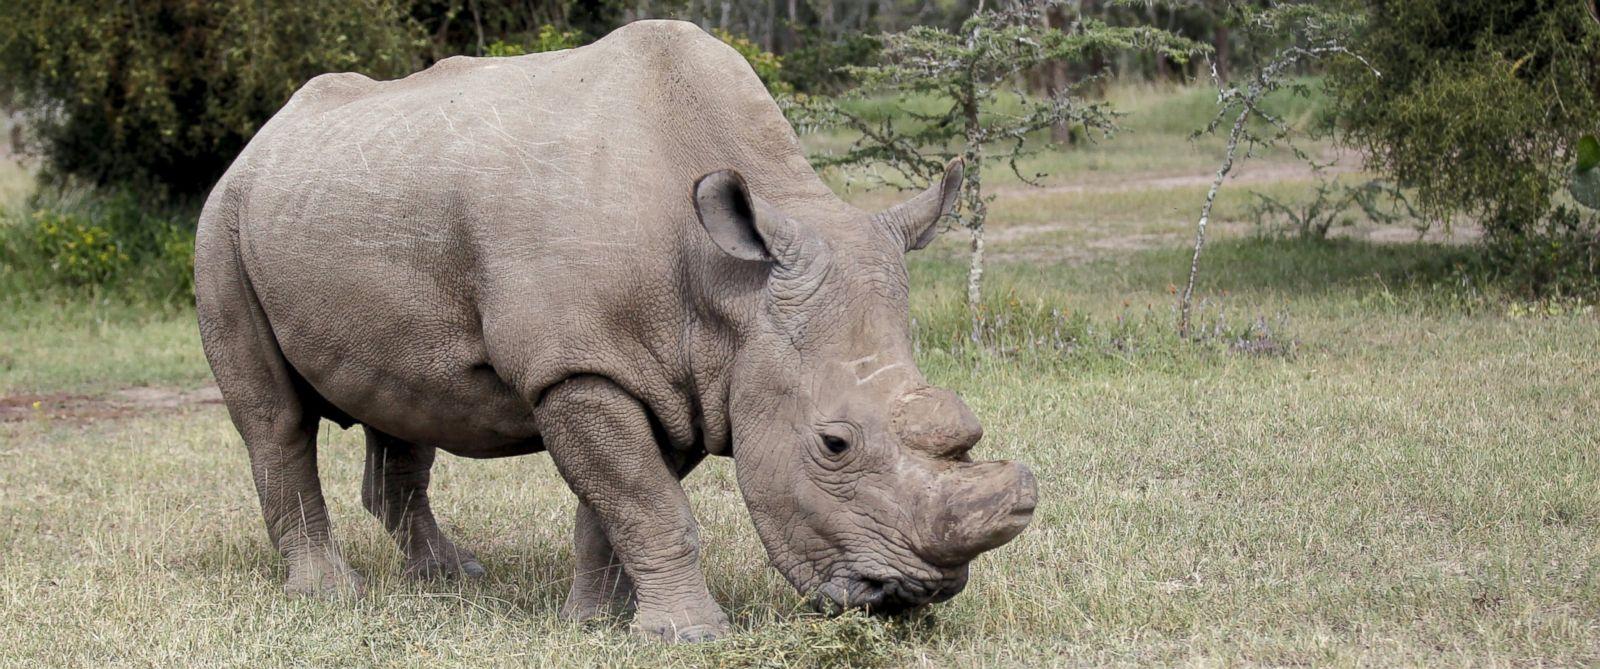 news world male rhino tinder dating